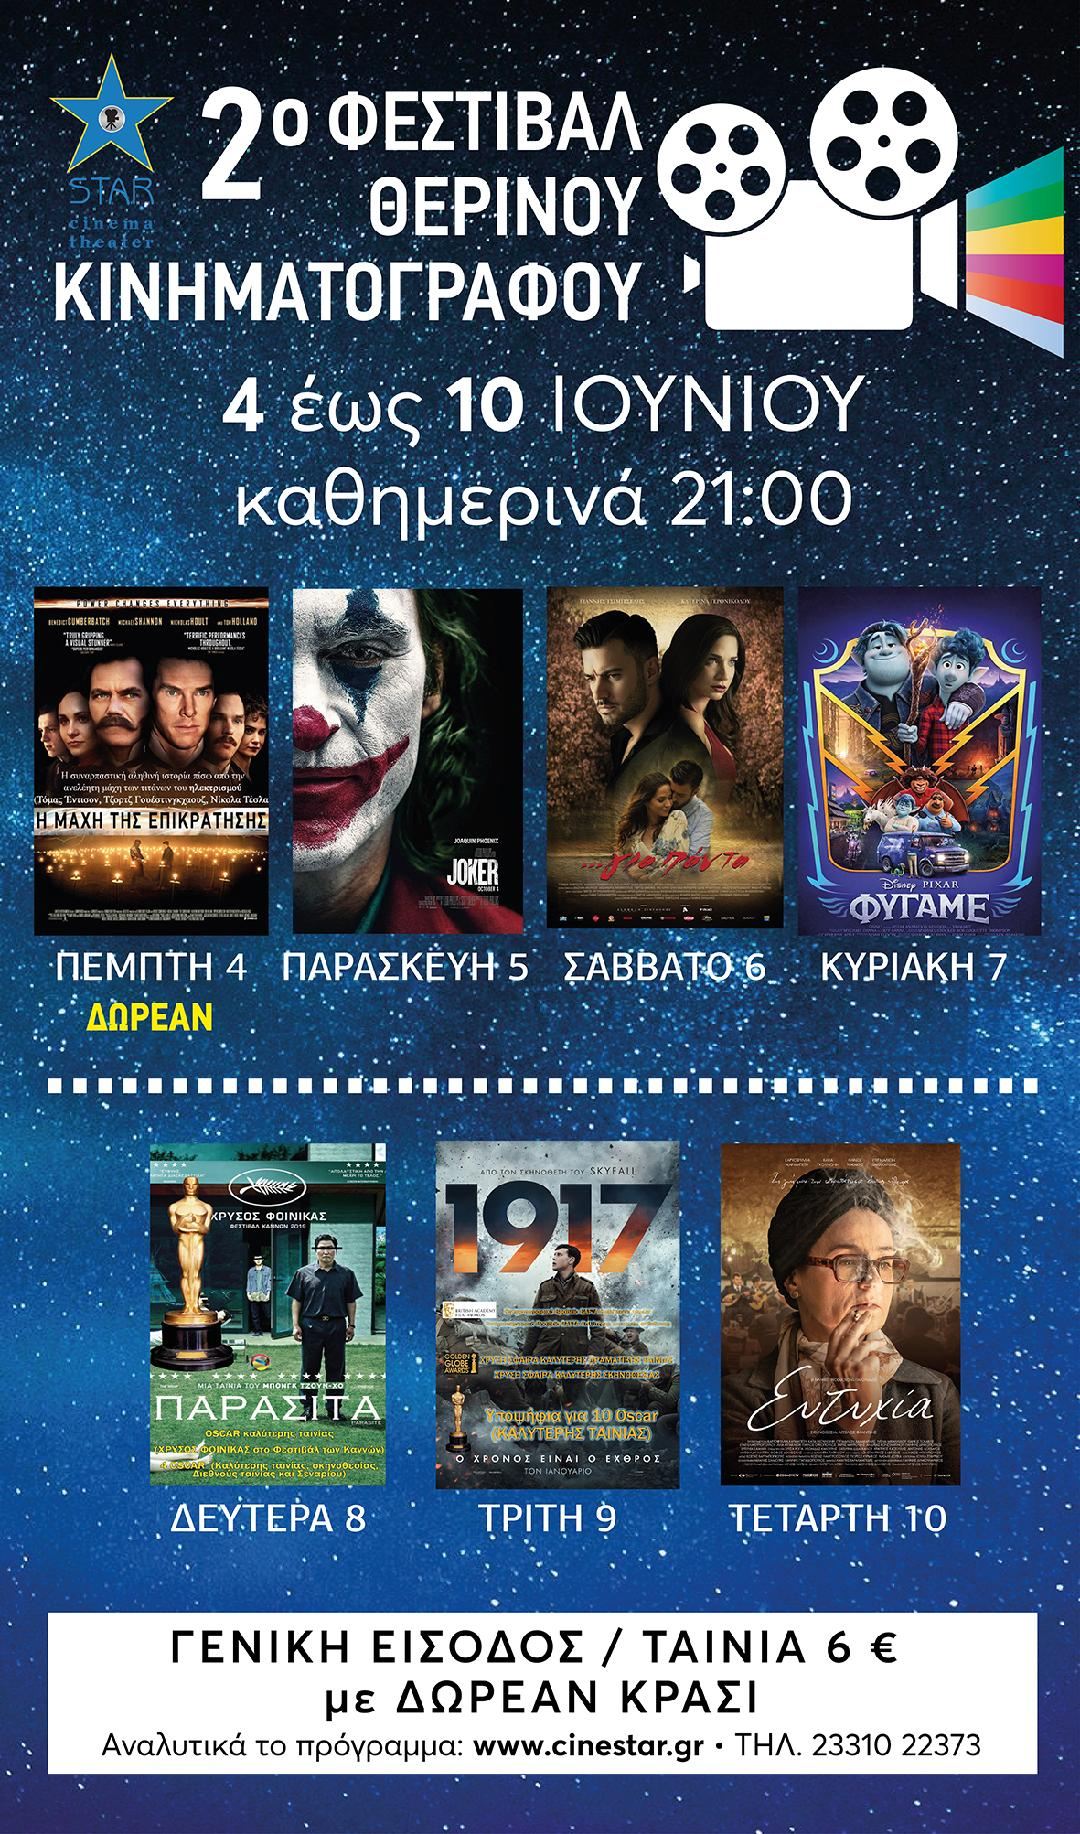 2o Φεστιβάλ Θερινού κινηματογράφου ΣΤΑΡ